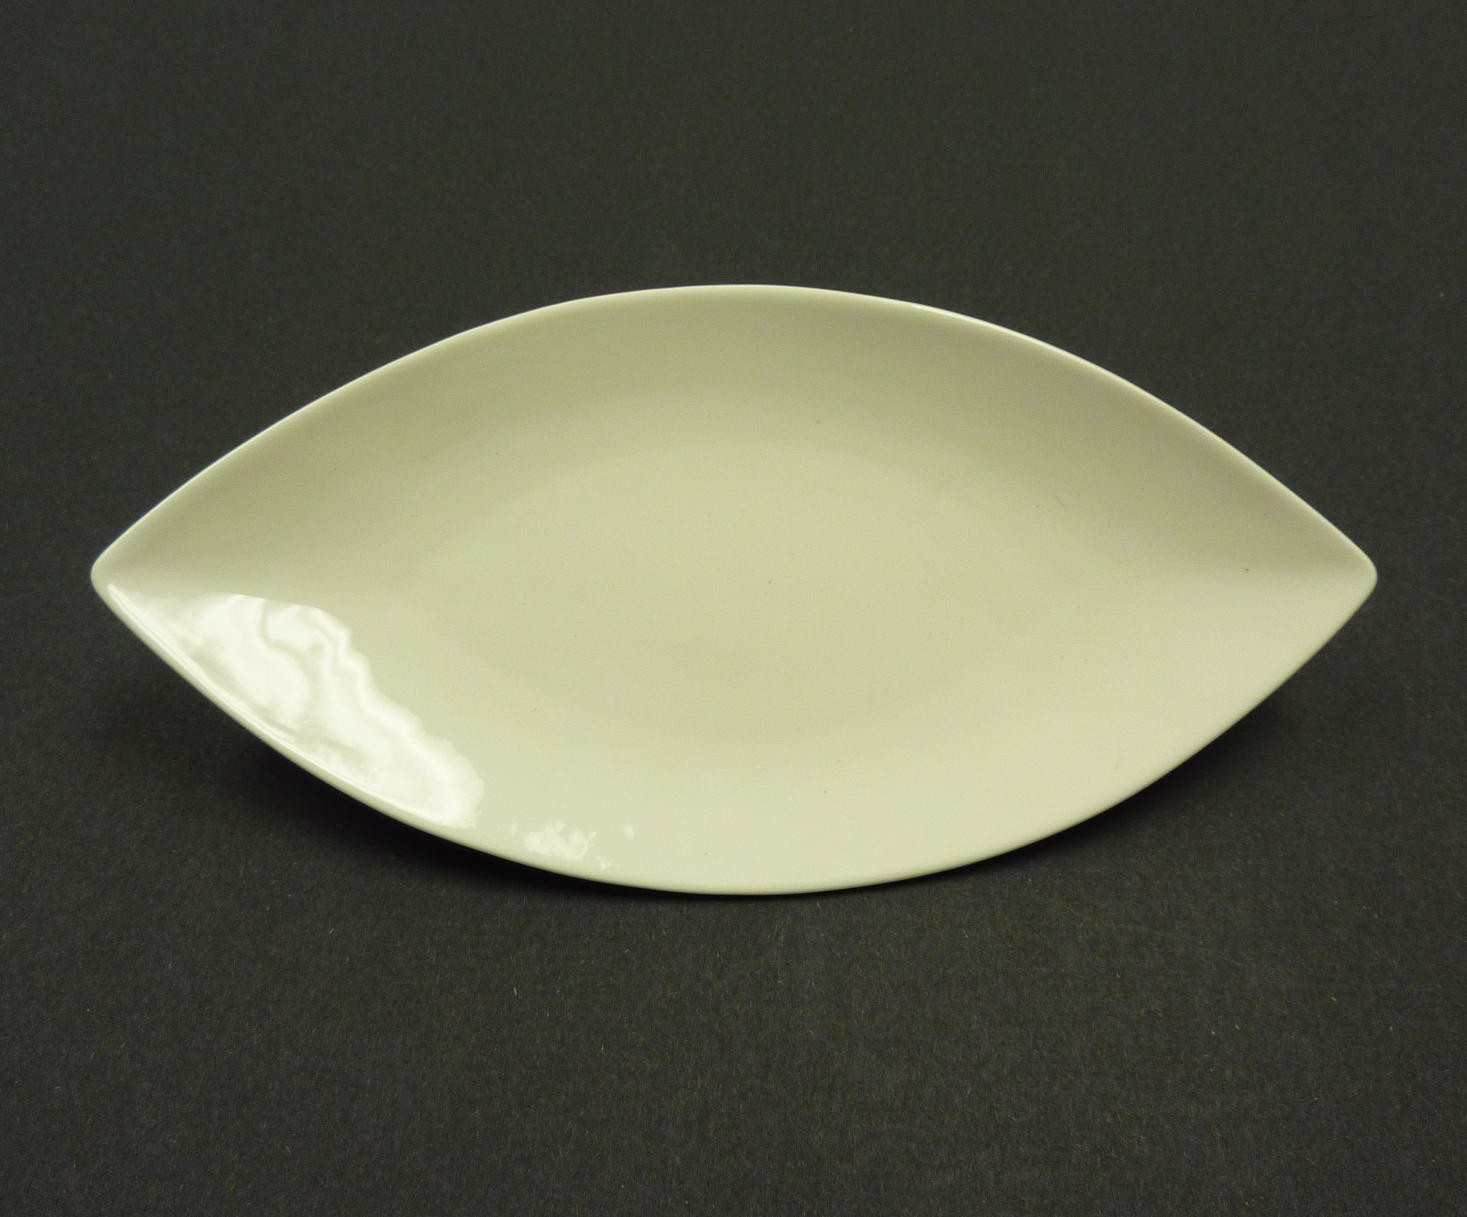 "Yanco fu-213 Fuji 13"" Oval Plate"